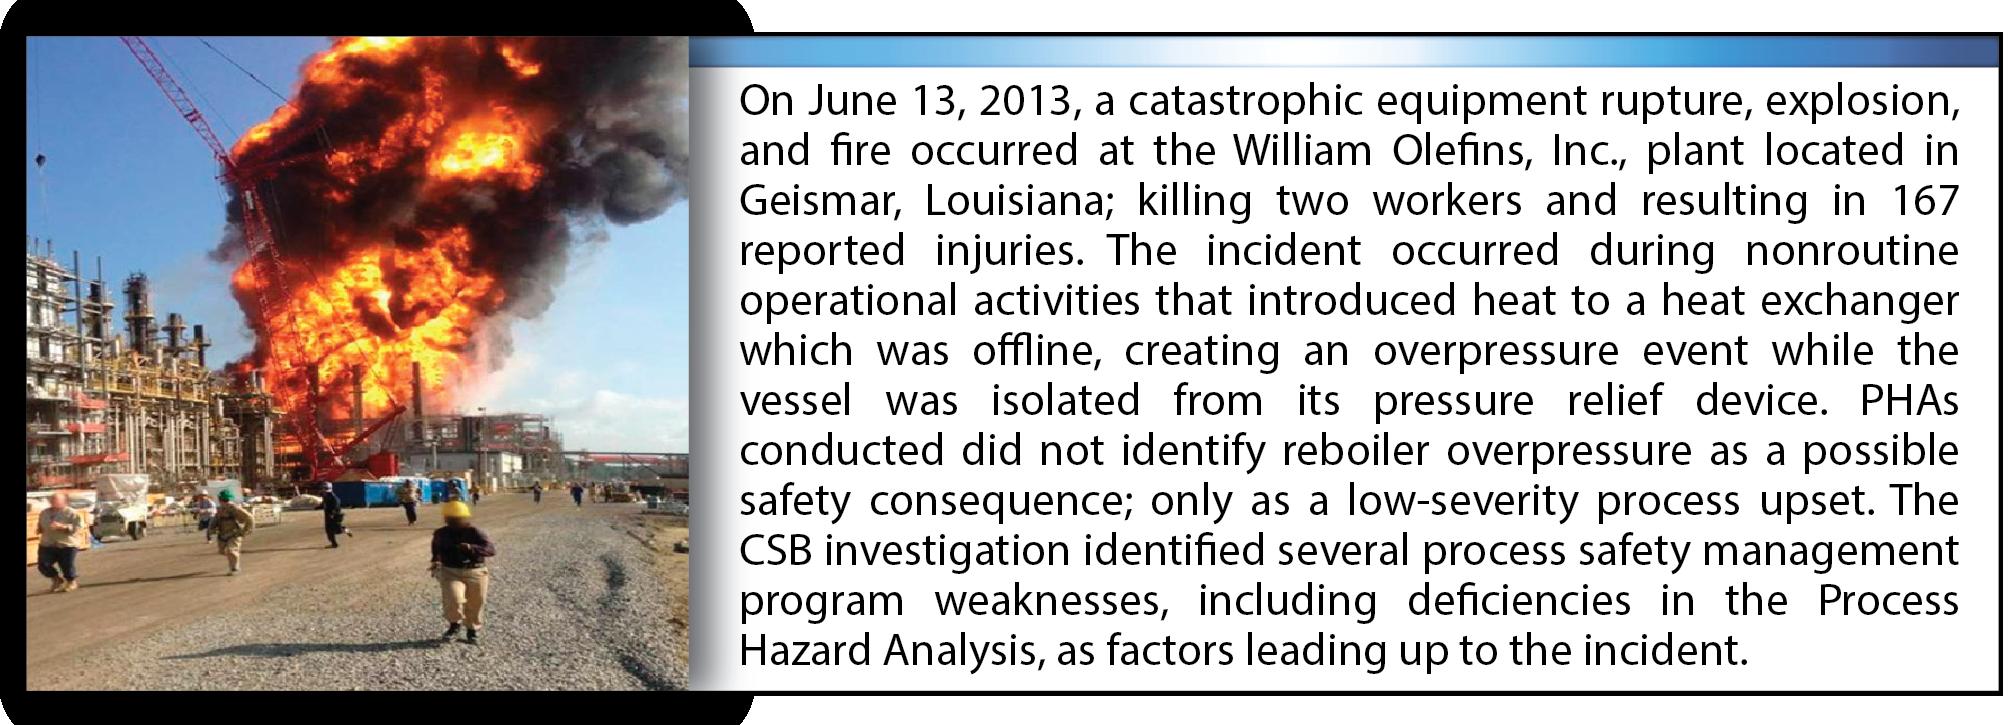 Figure 1c. – William Olefins, Inc. Explosion and Fire[5]